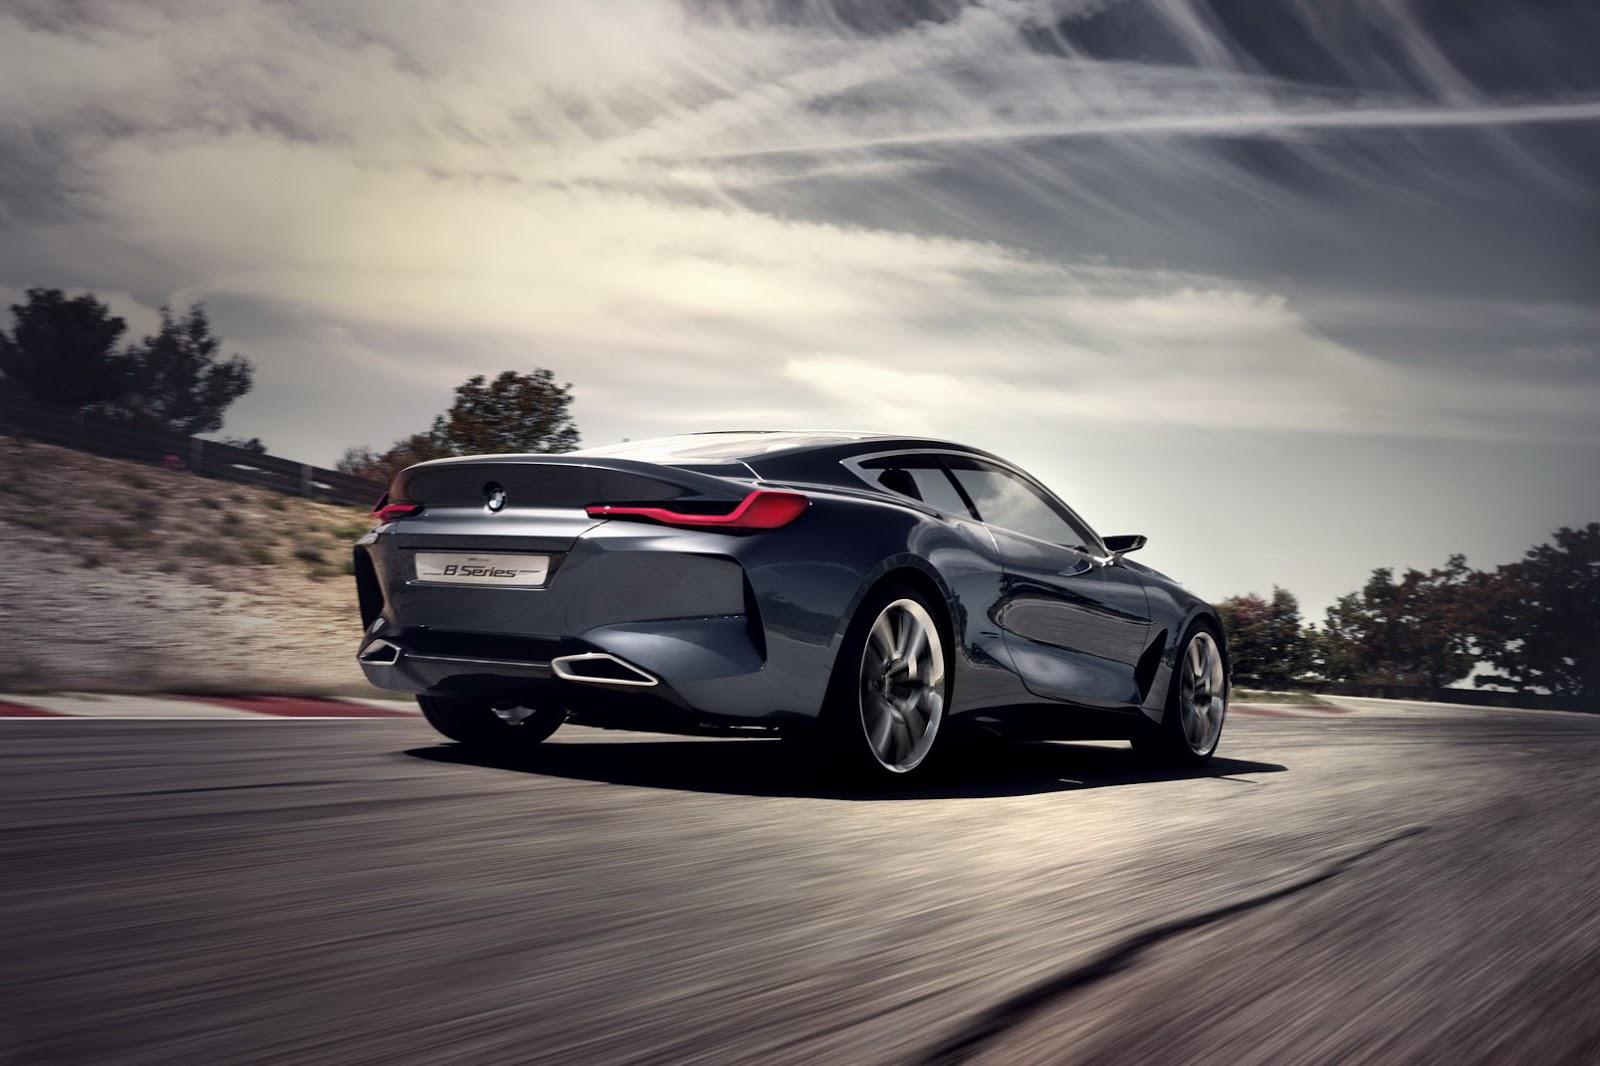 BMW_Concept_8_Series_14